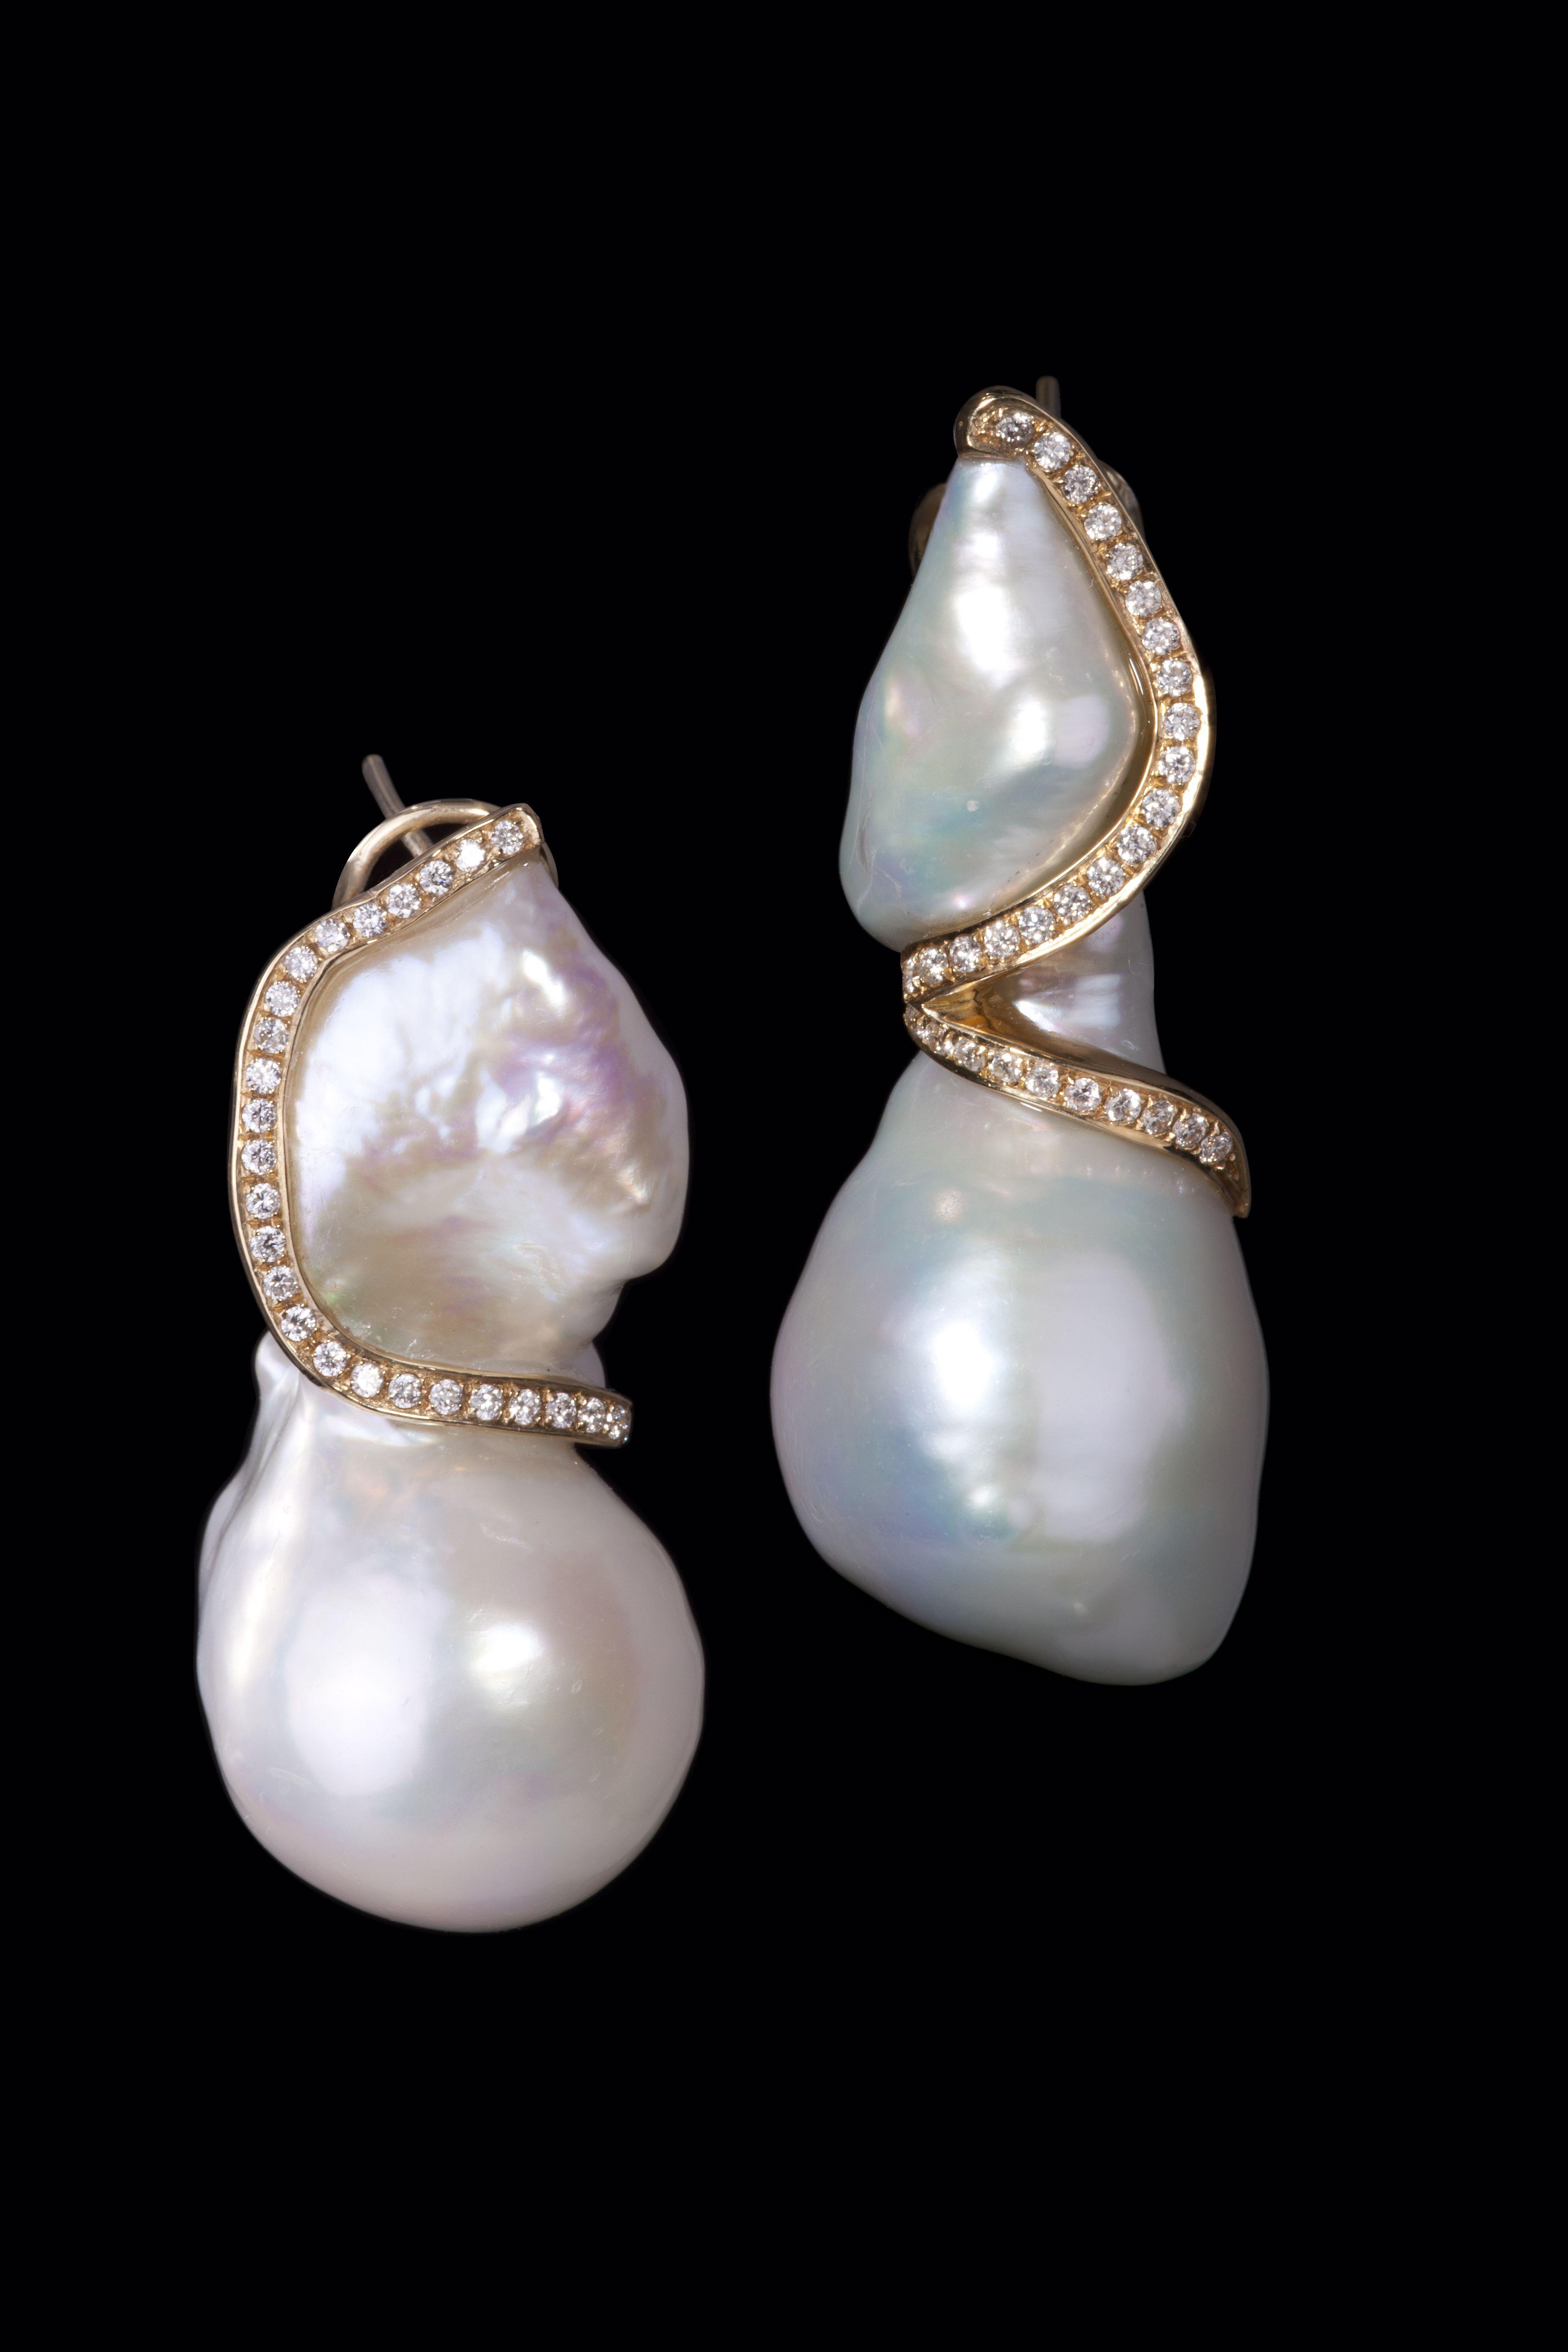 Baroque Pearl Earrings Jewelry Pearl Earrings Pearls